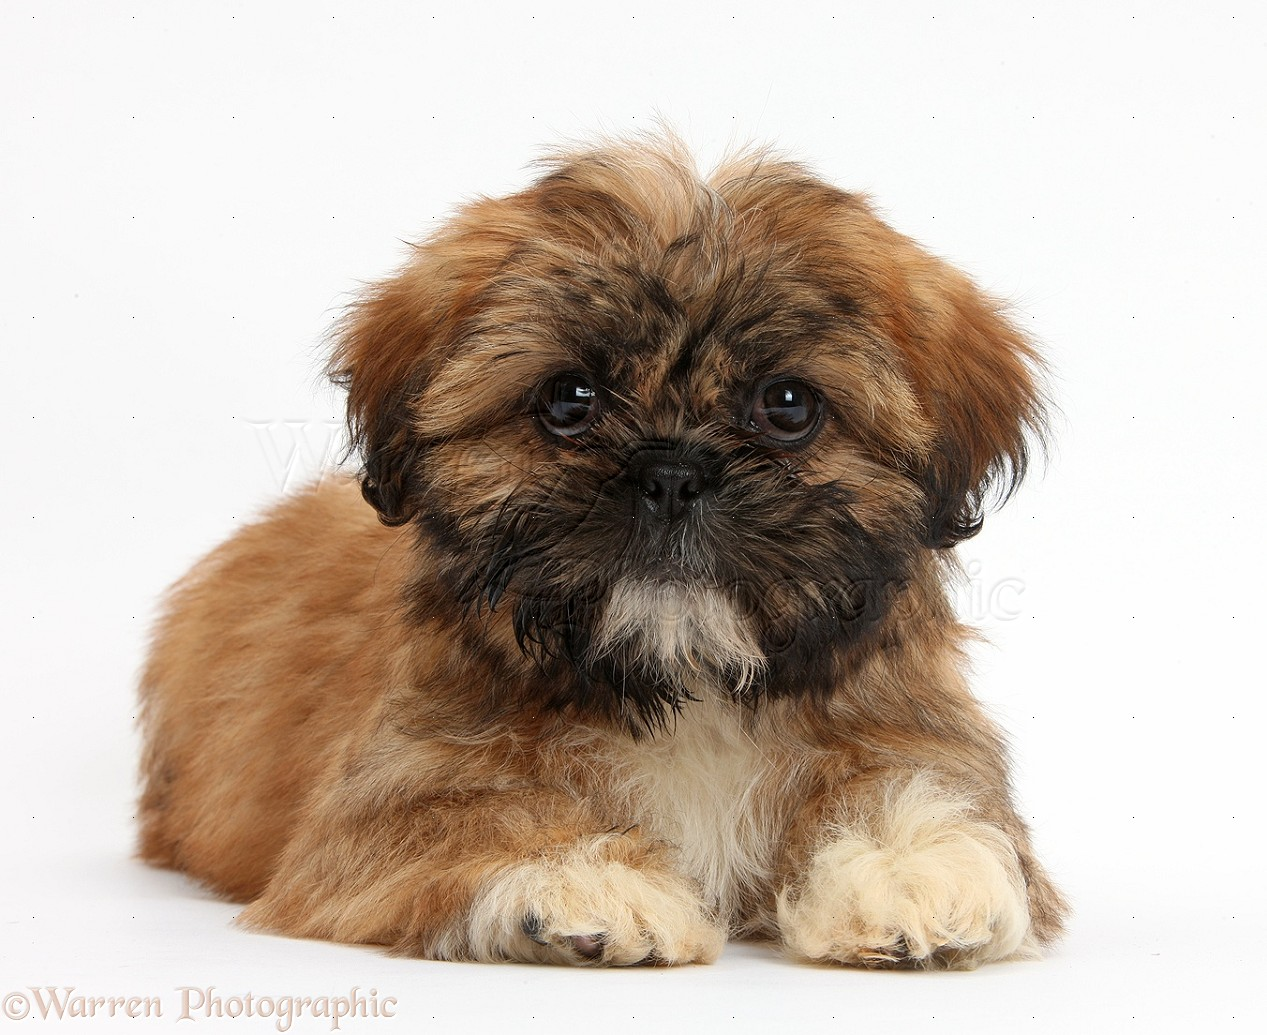 DogBrownShihTzuPupLyingWithHeadUpPhotoWp38154